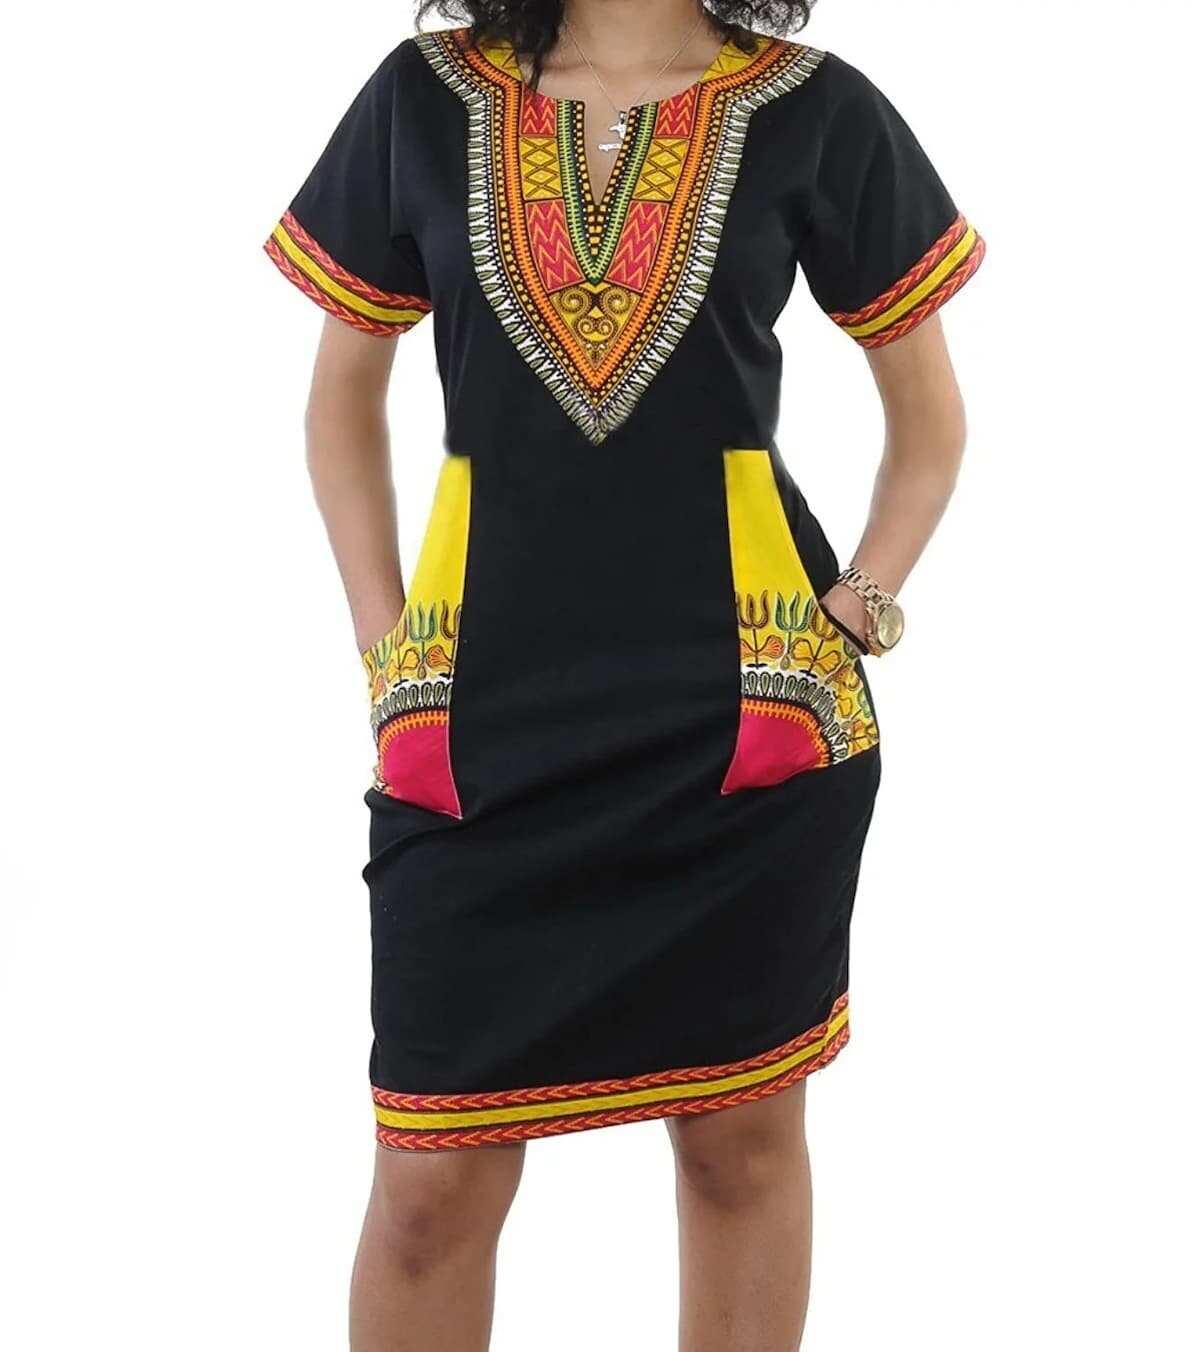 pretty short african dresses, short african print dresses 2018, short african prom dresses